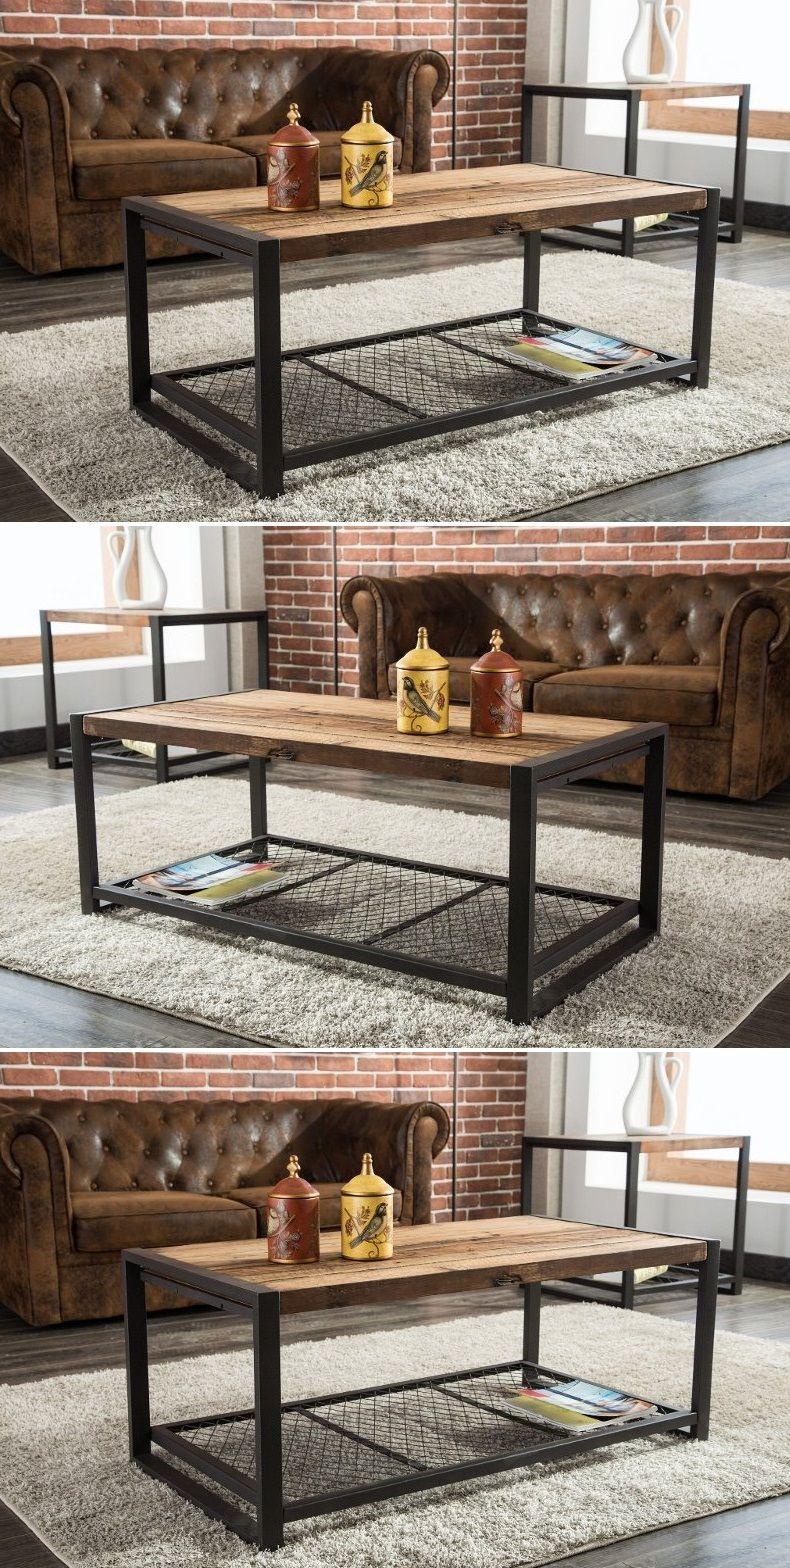 Wood And Metal Sofa Table 2019 Con Imagenes Diseno Industrial